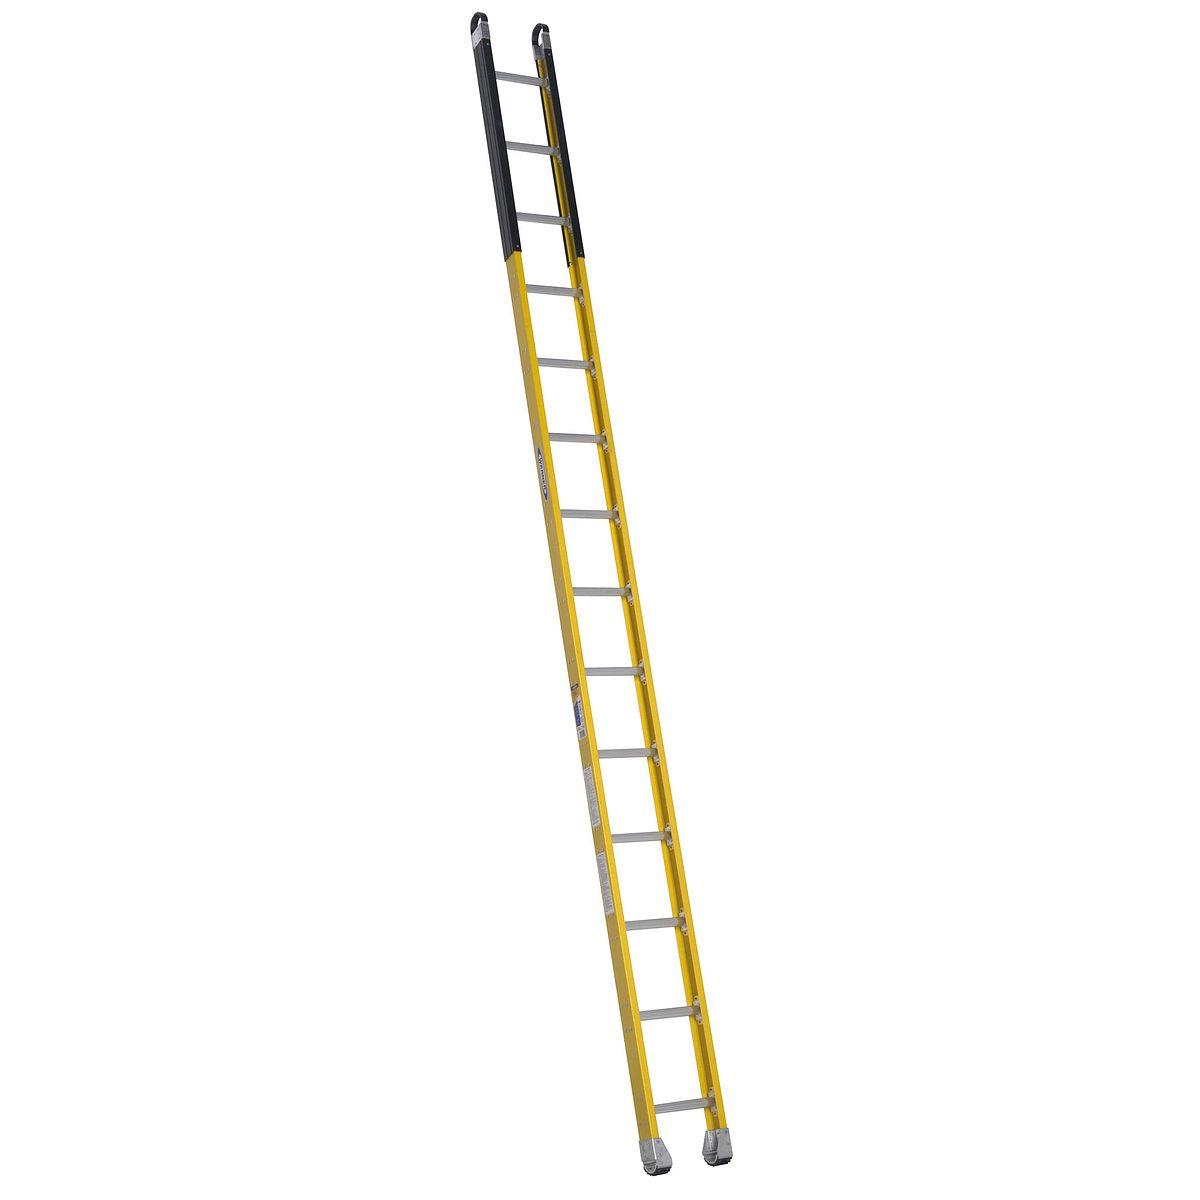 M7114 1 Extension Ladders Werner Us